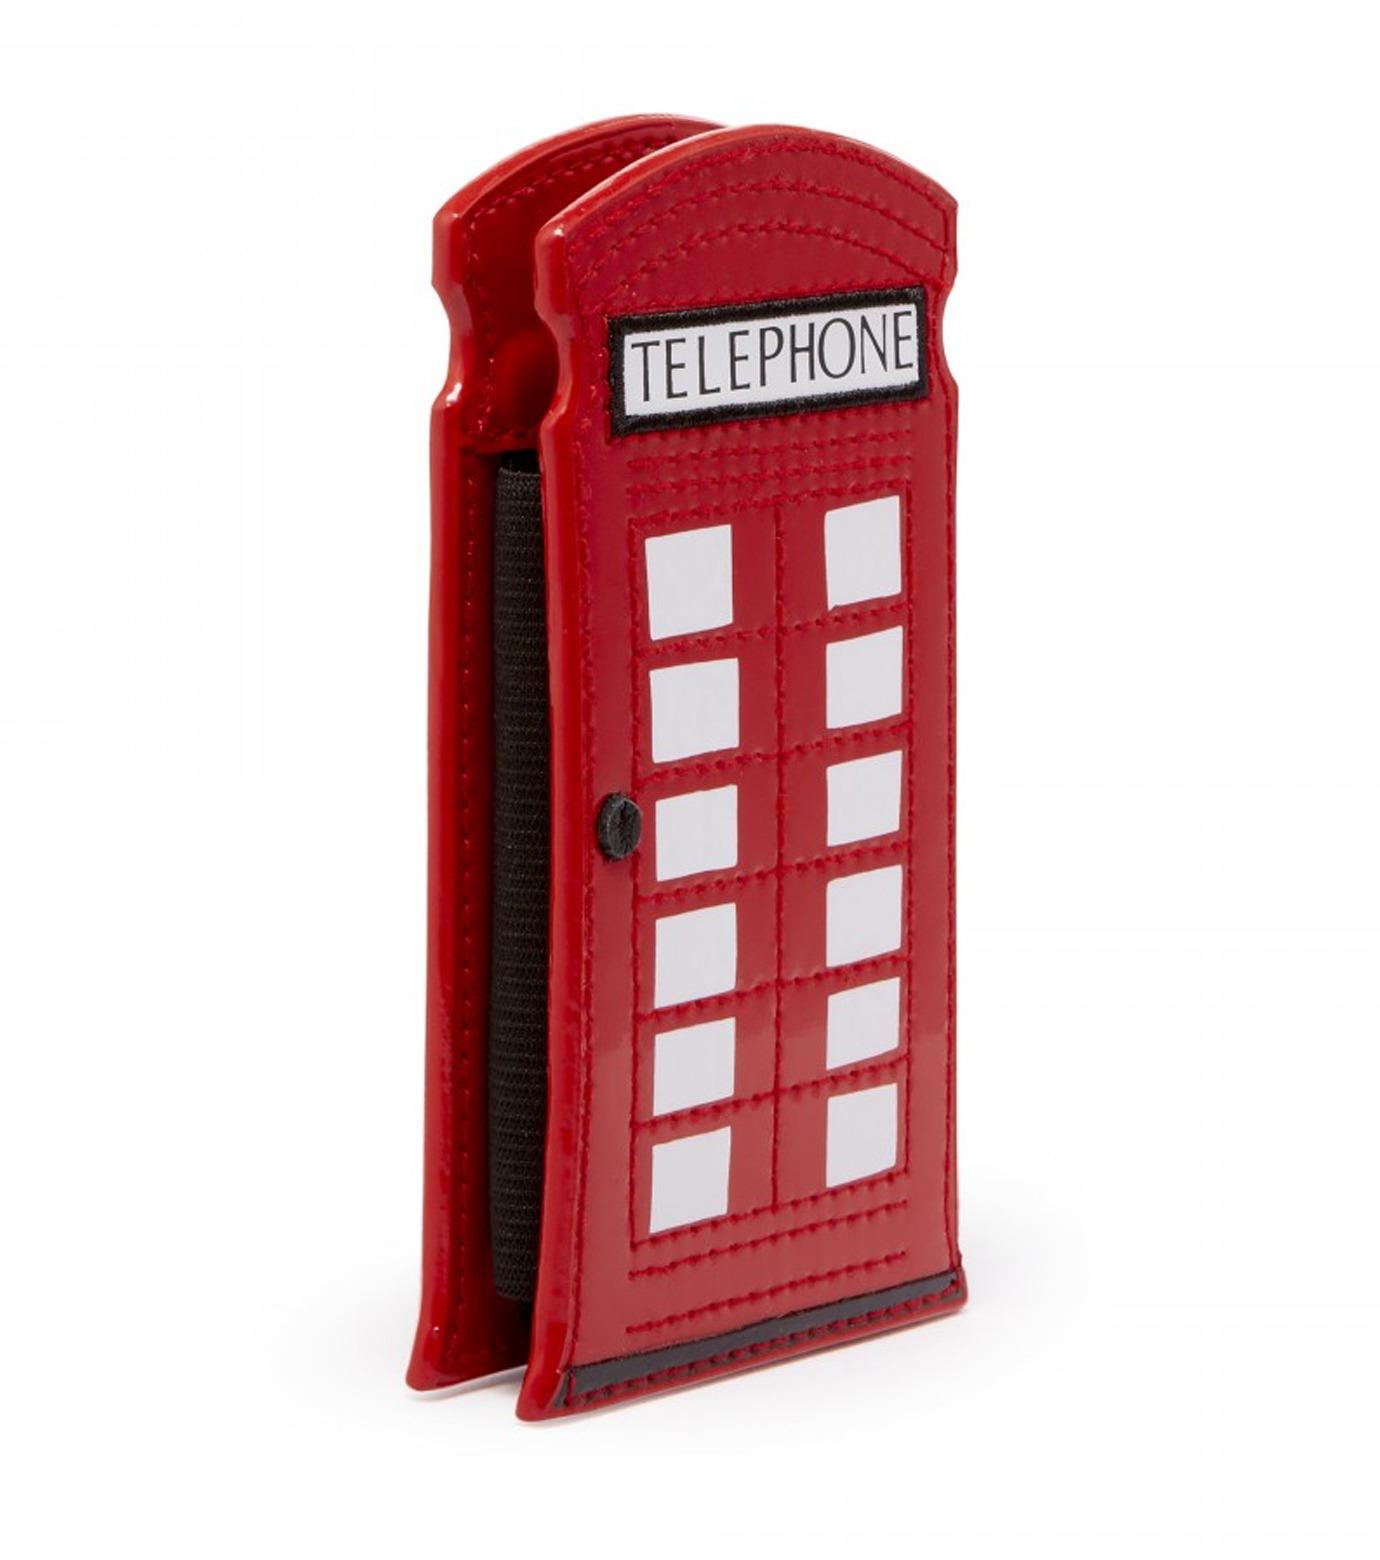 Lulu Guinness(ルル・ギネス)のTelephone Box Phone Holder-RED(ケースiphone5/5s/se/case iphone5/5s/se)-50003235-62 拡大詳細画像2